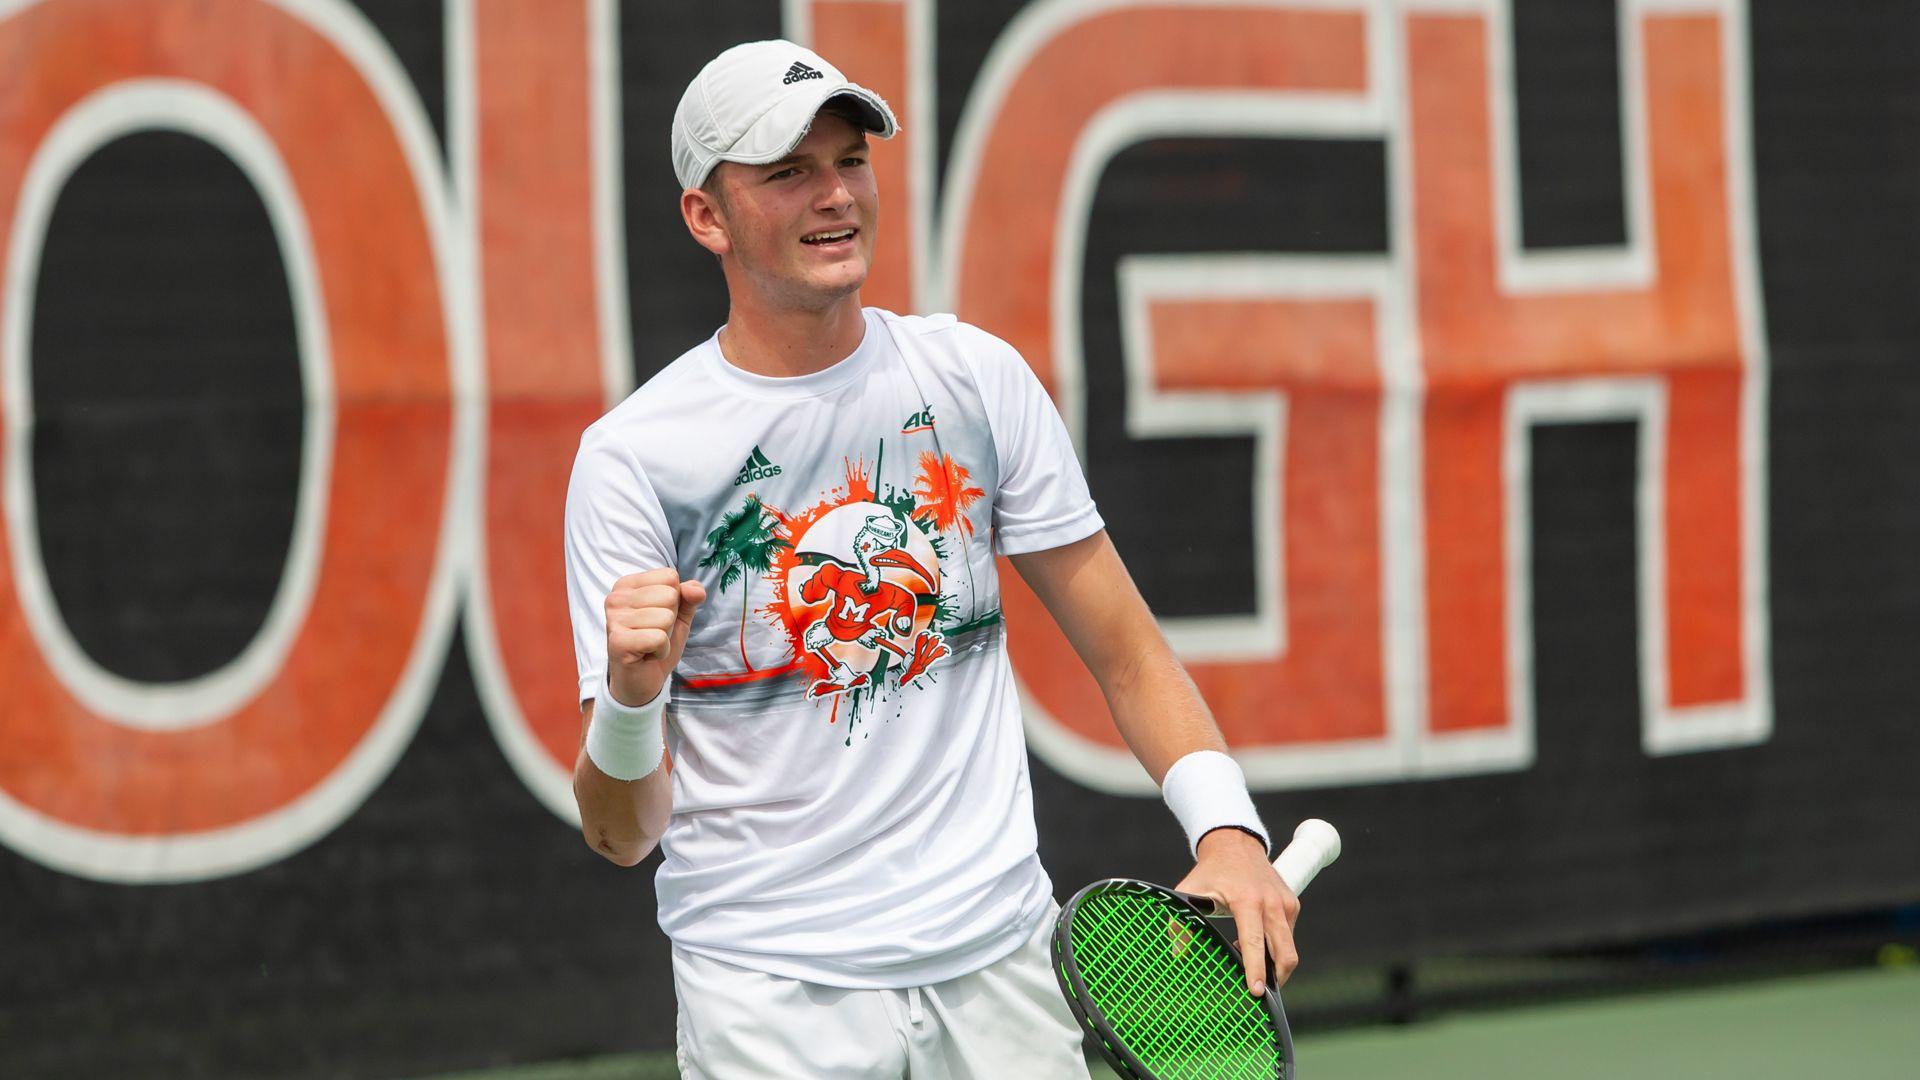 M. Tennis Completes Comeback Against Virginia Tech, 4-3